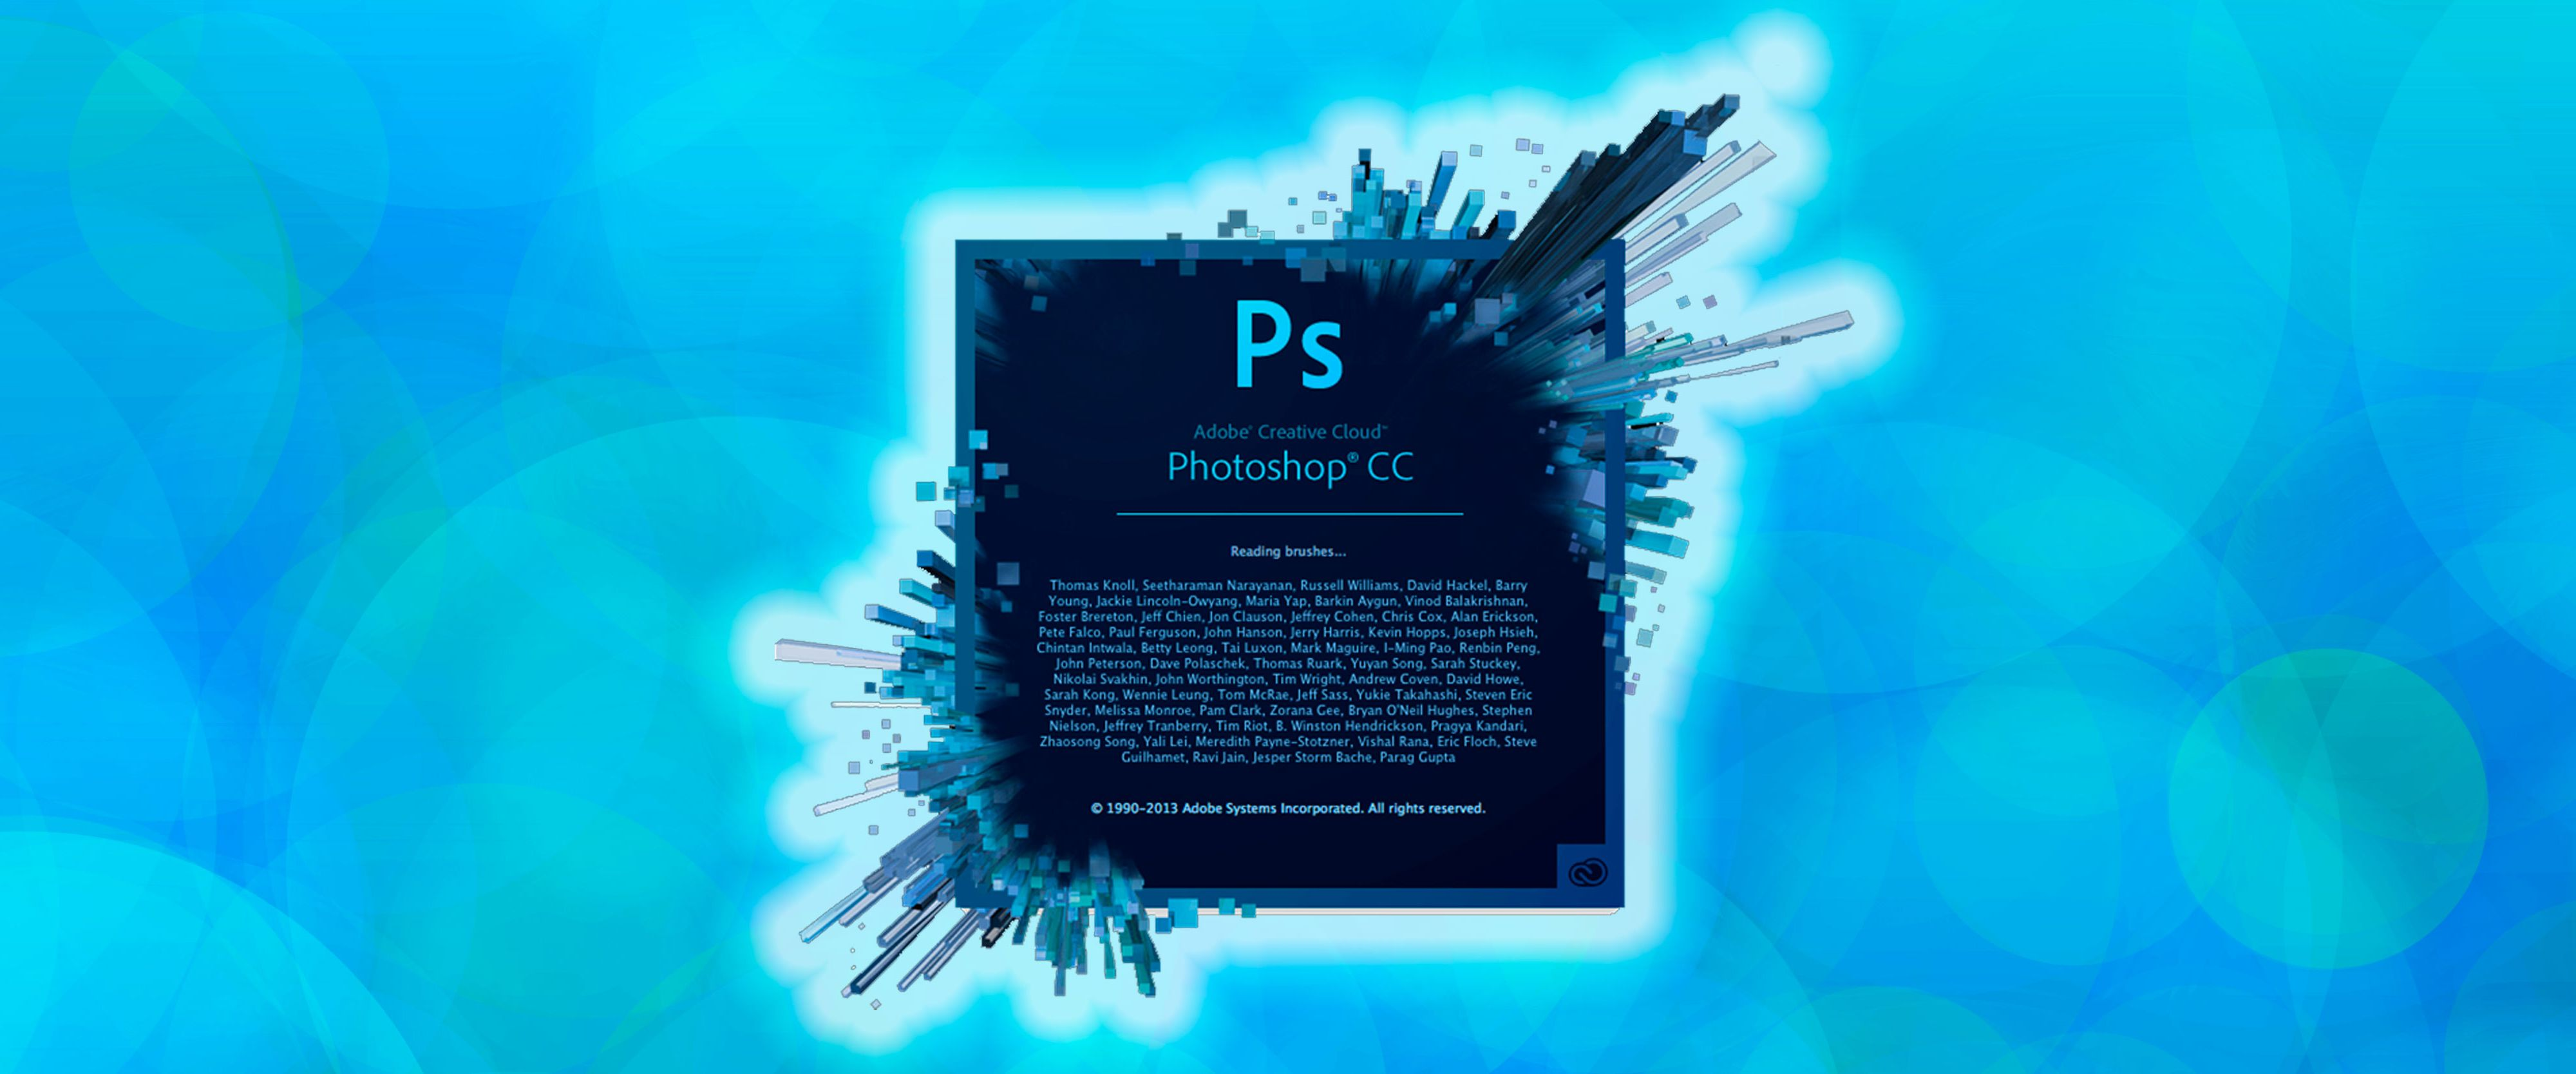 Nå støtter Photoshop 3D-printing